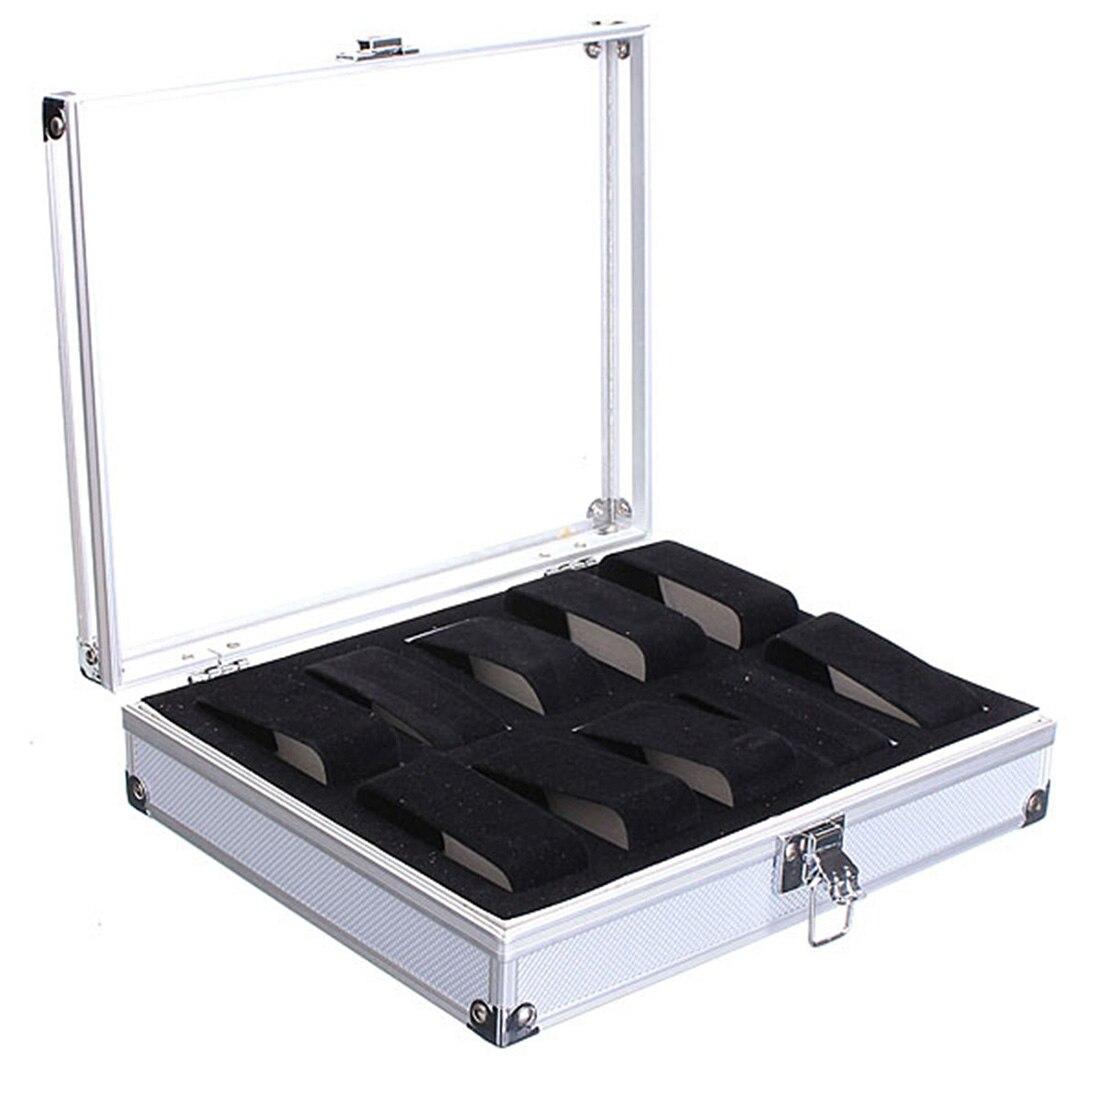 Aluminium Horloge Storage Case Armband Organisator Display Box Met Kussens Houders 10 Insert Slots Verfrissing